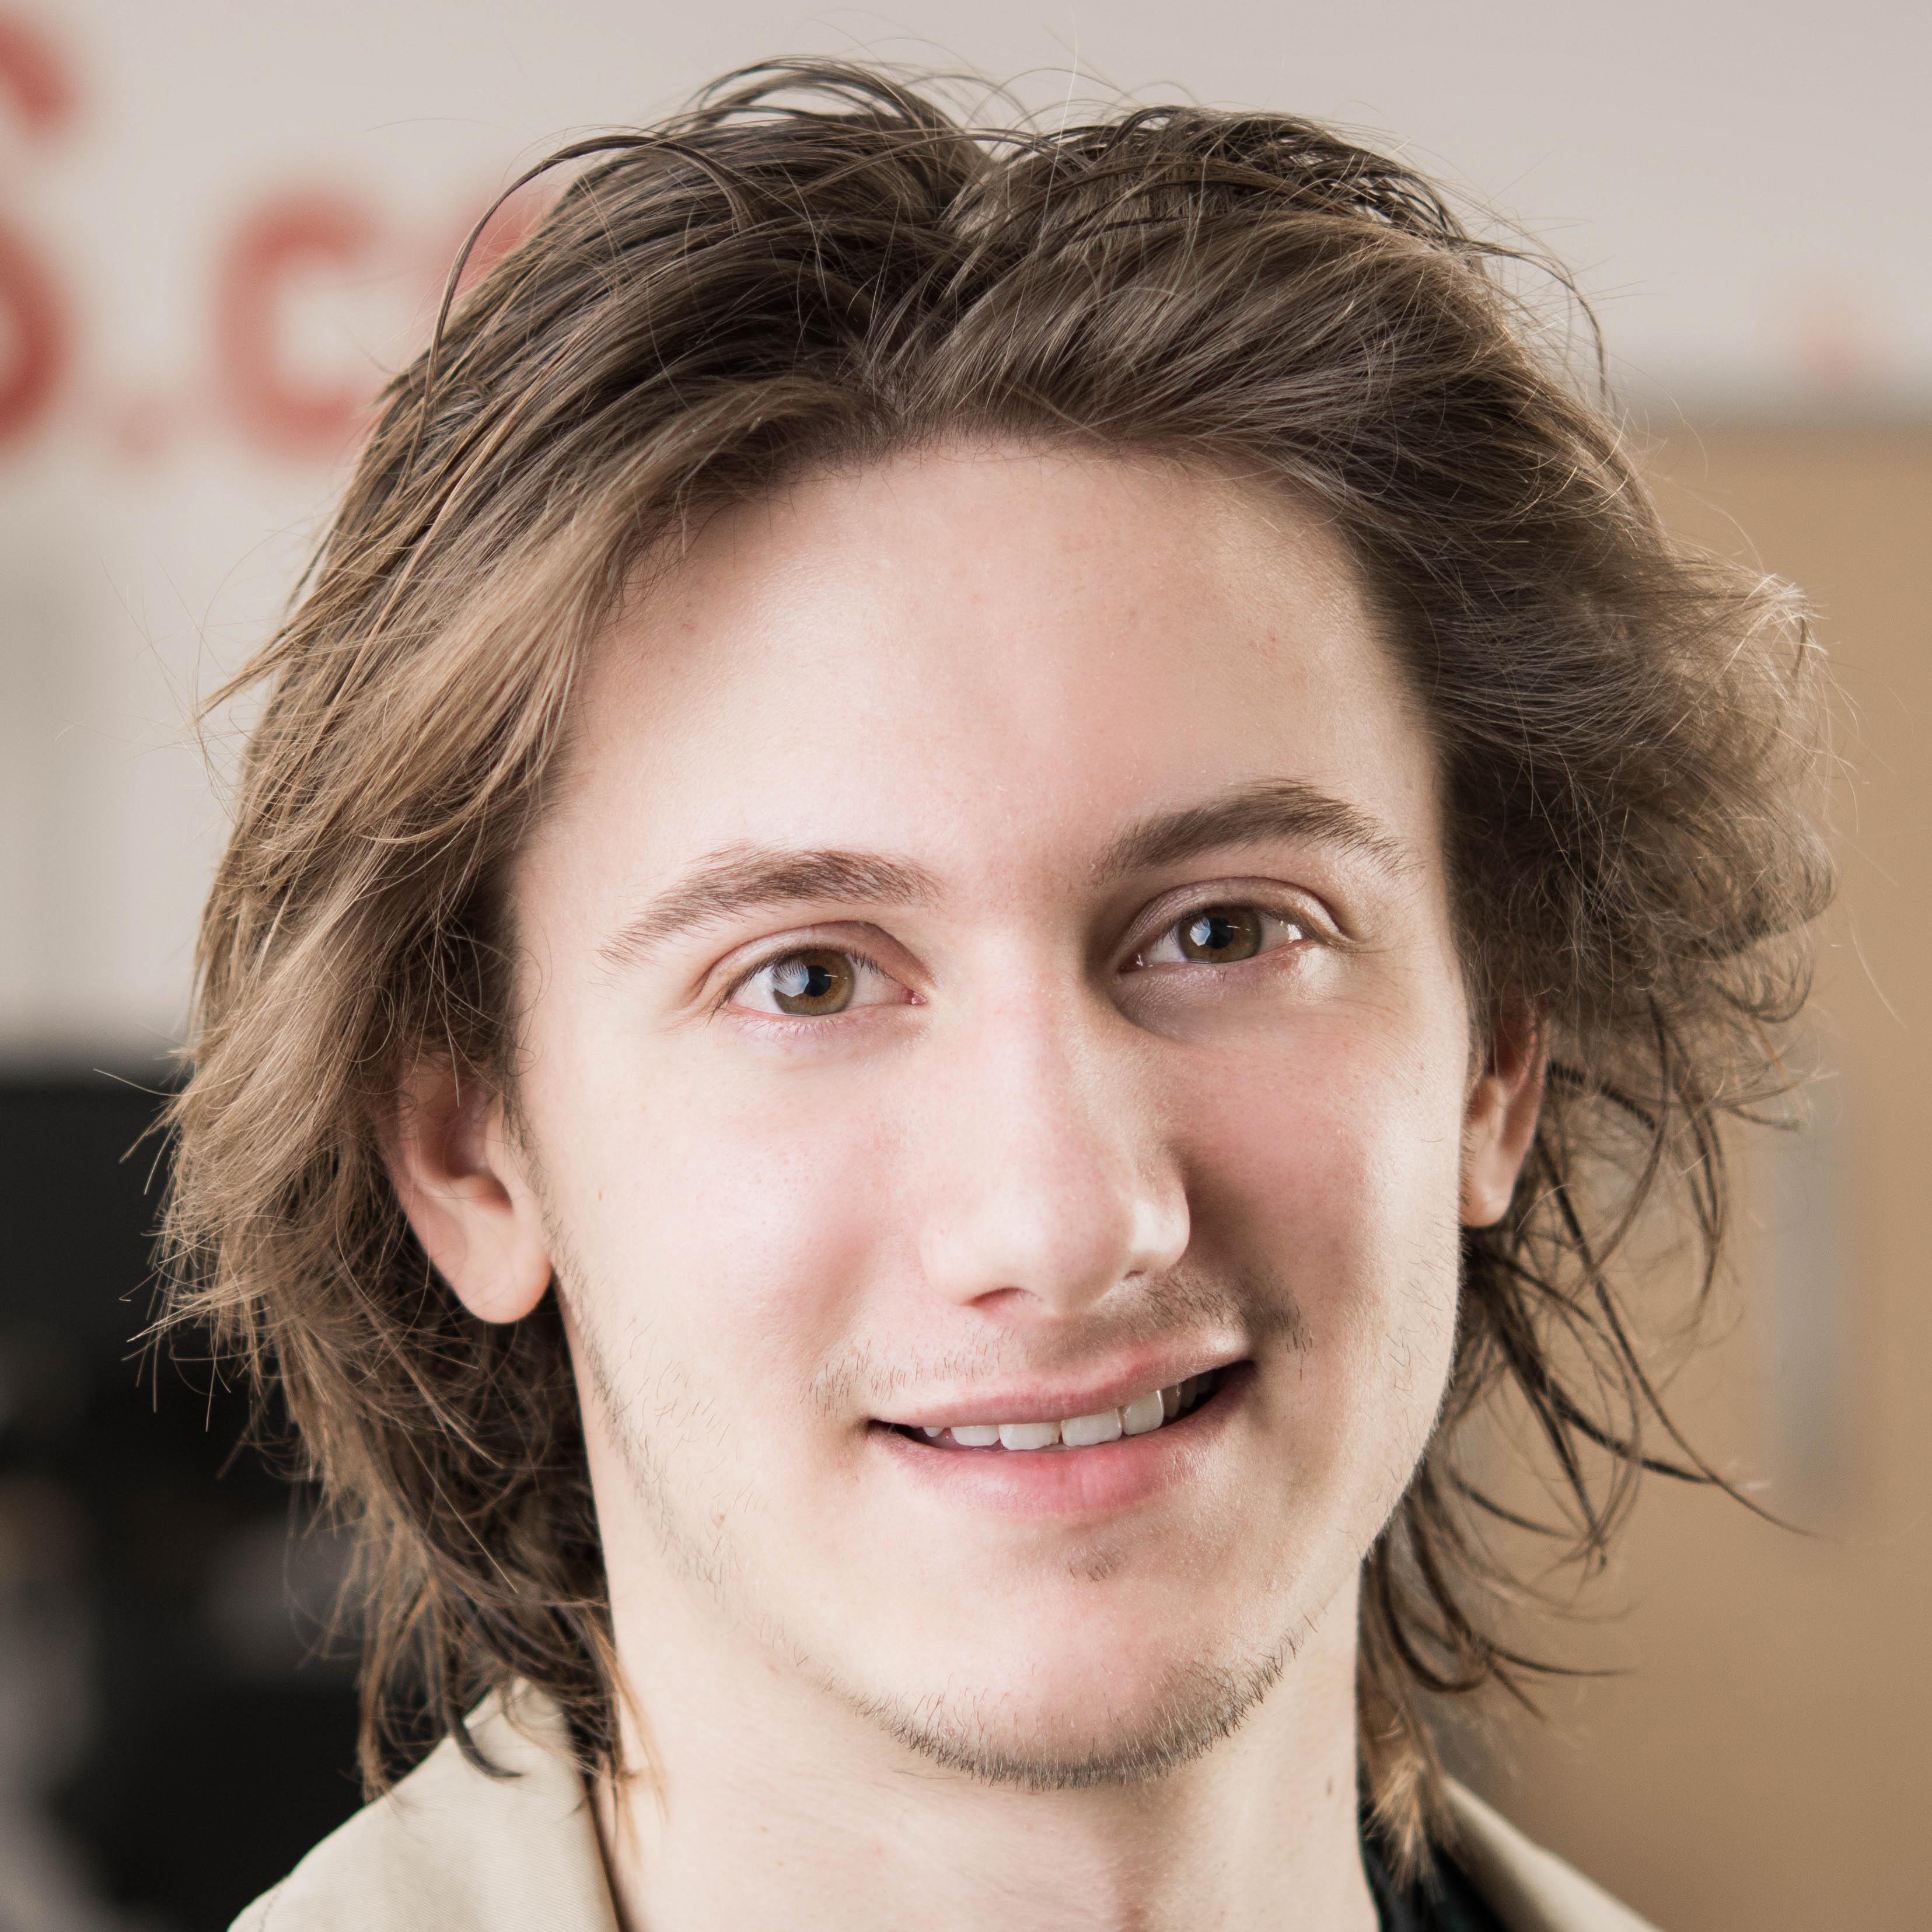 Photograph of Jackson Smylie